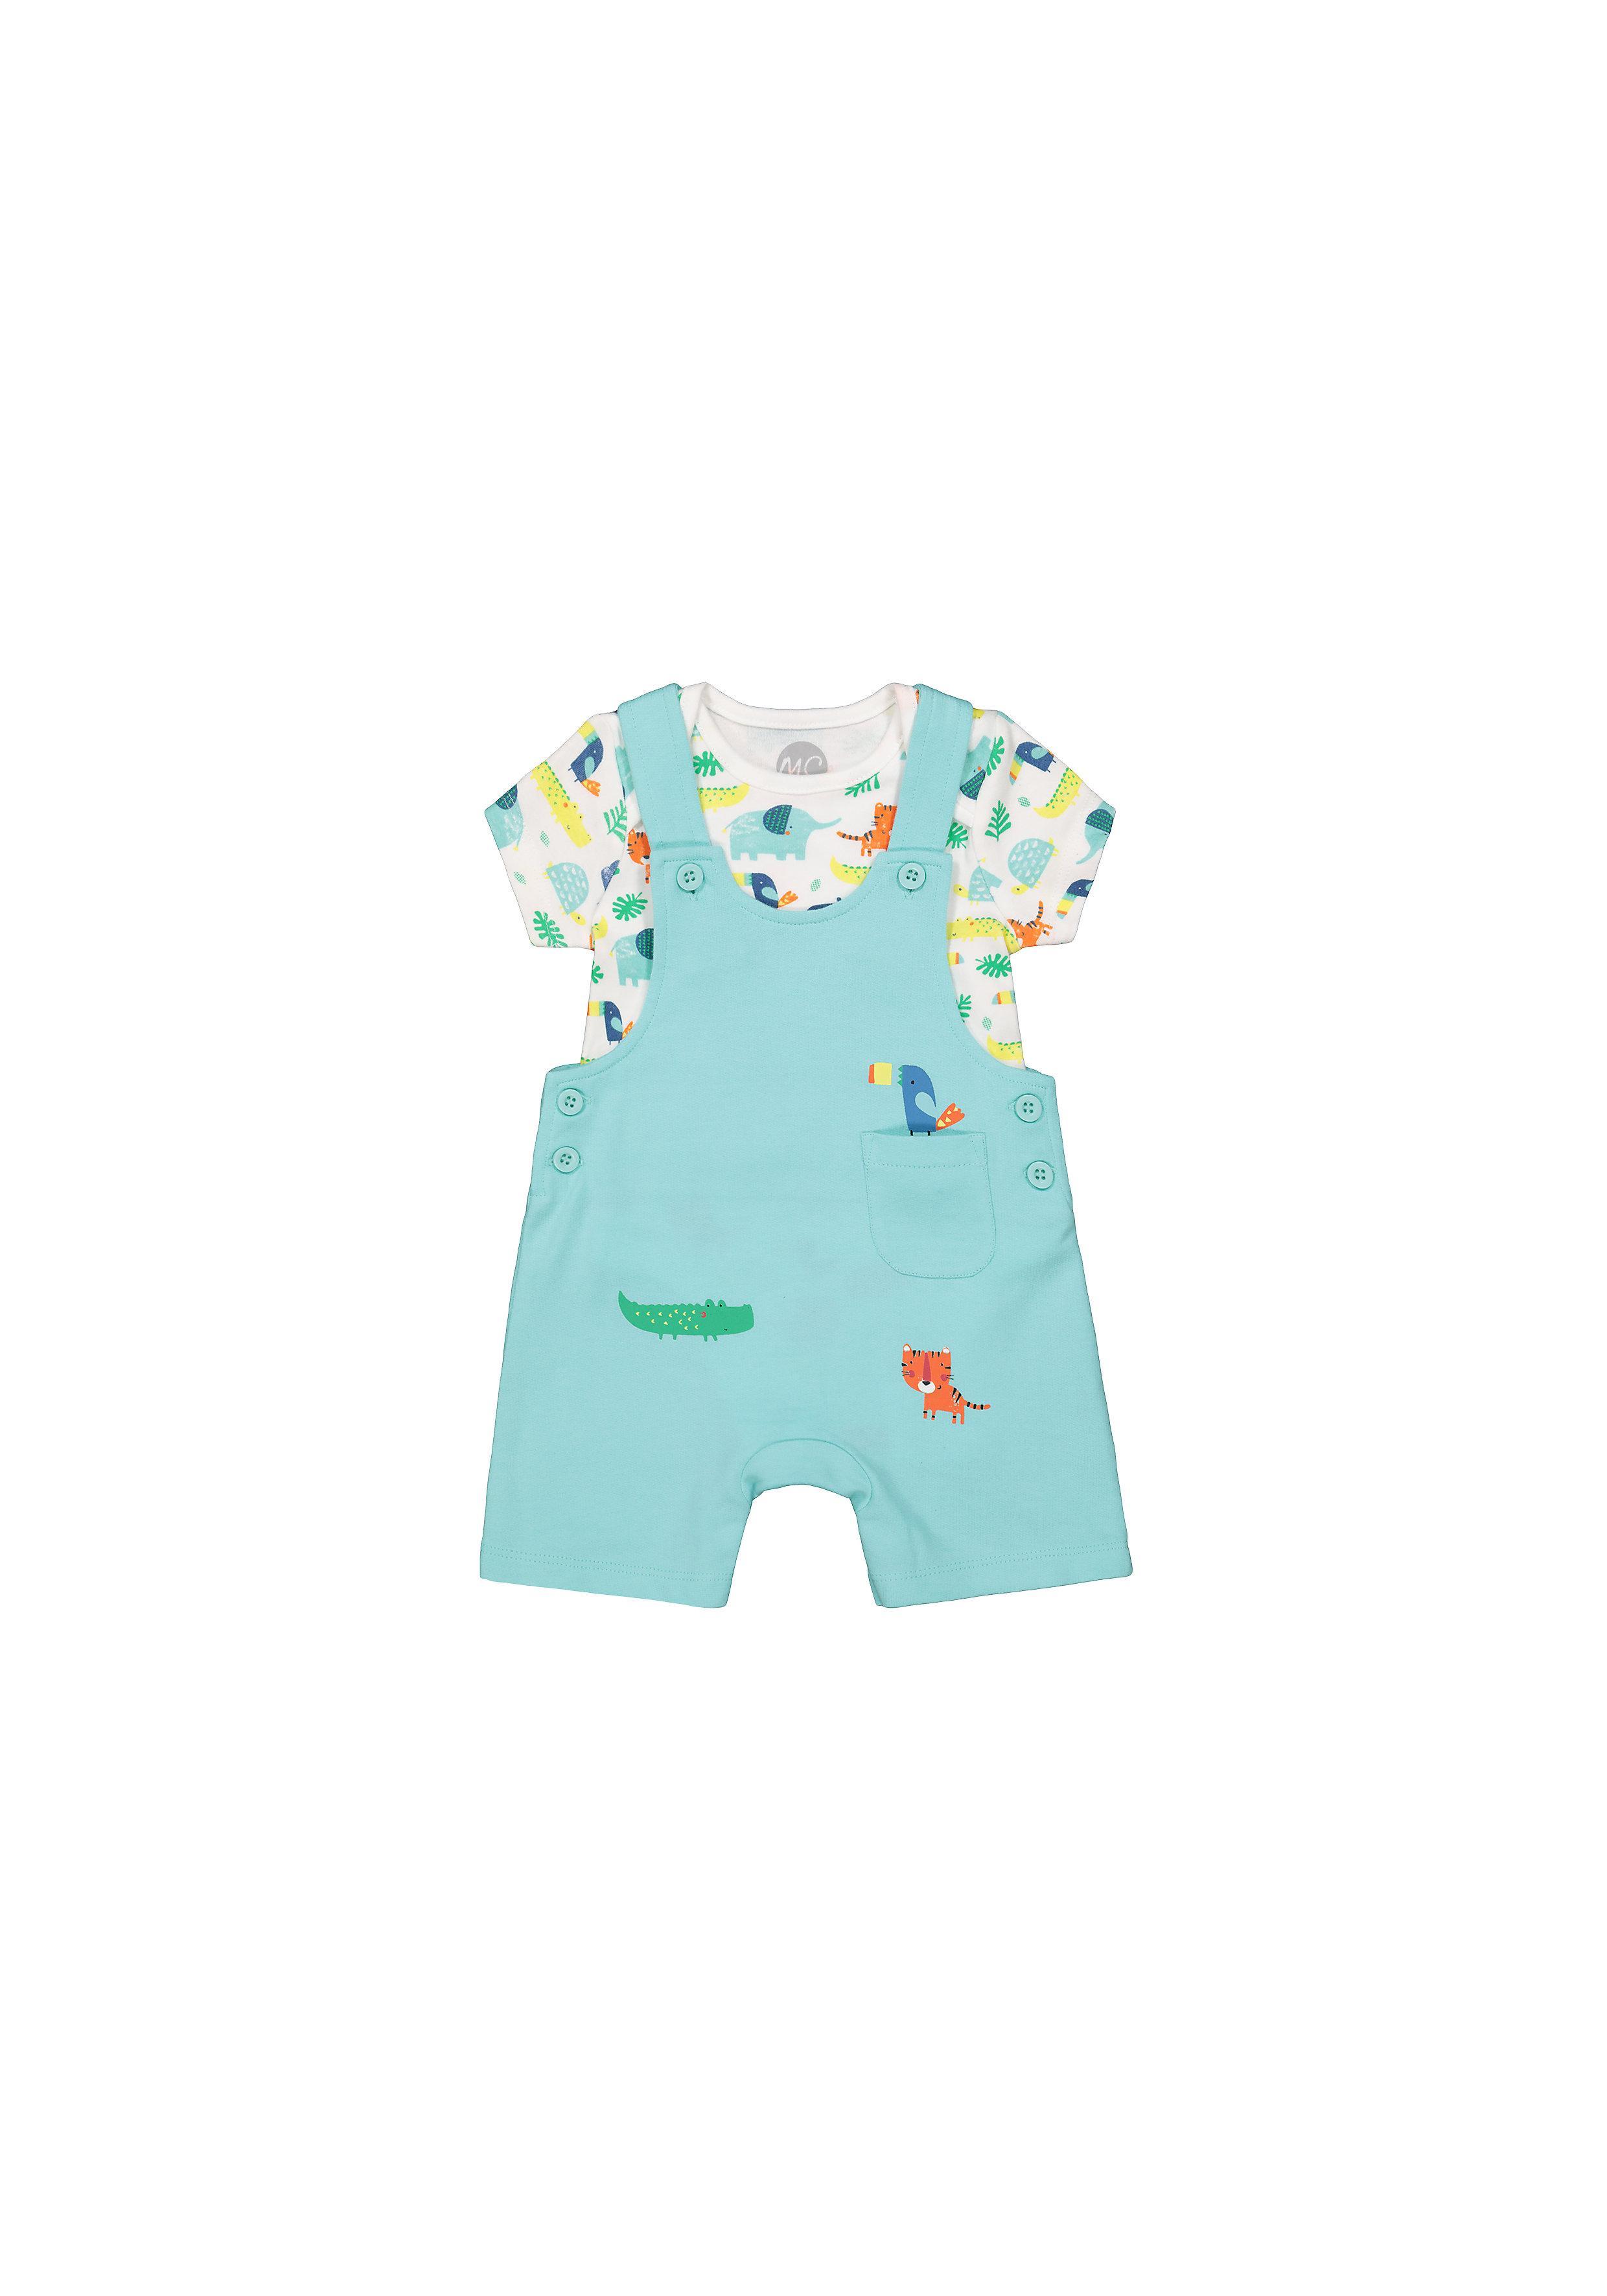 Mothercare | Boys Half Sleeves Dungaree Set Animal Print - Blue White